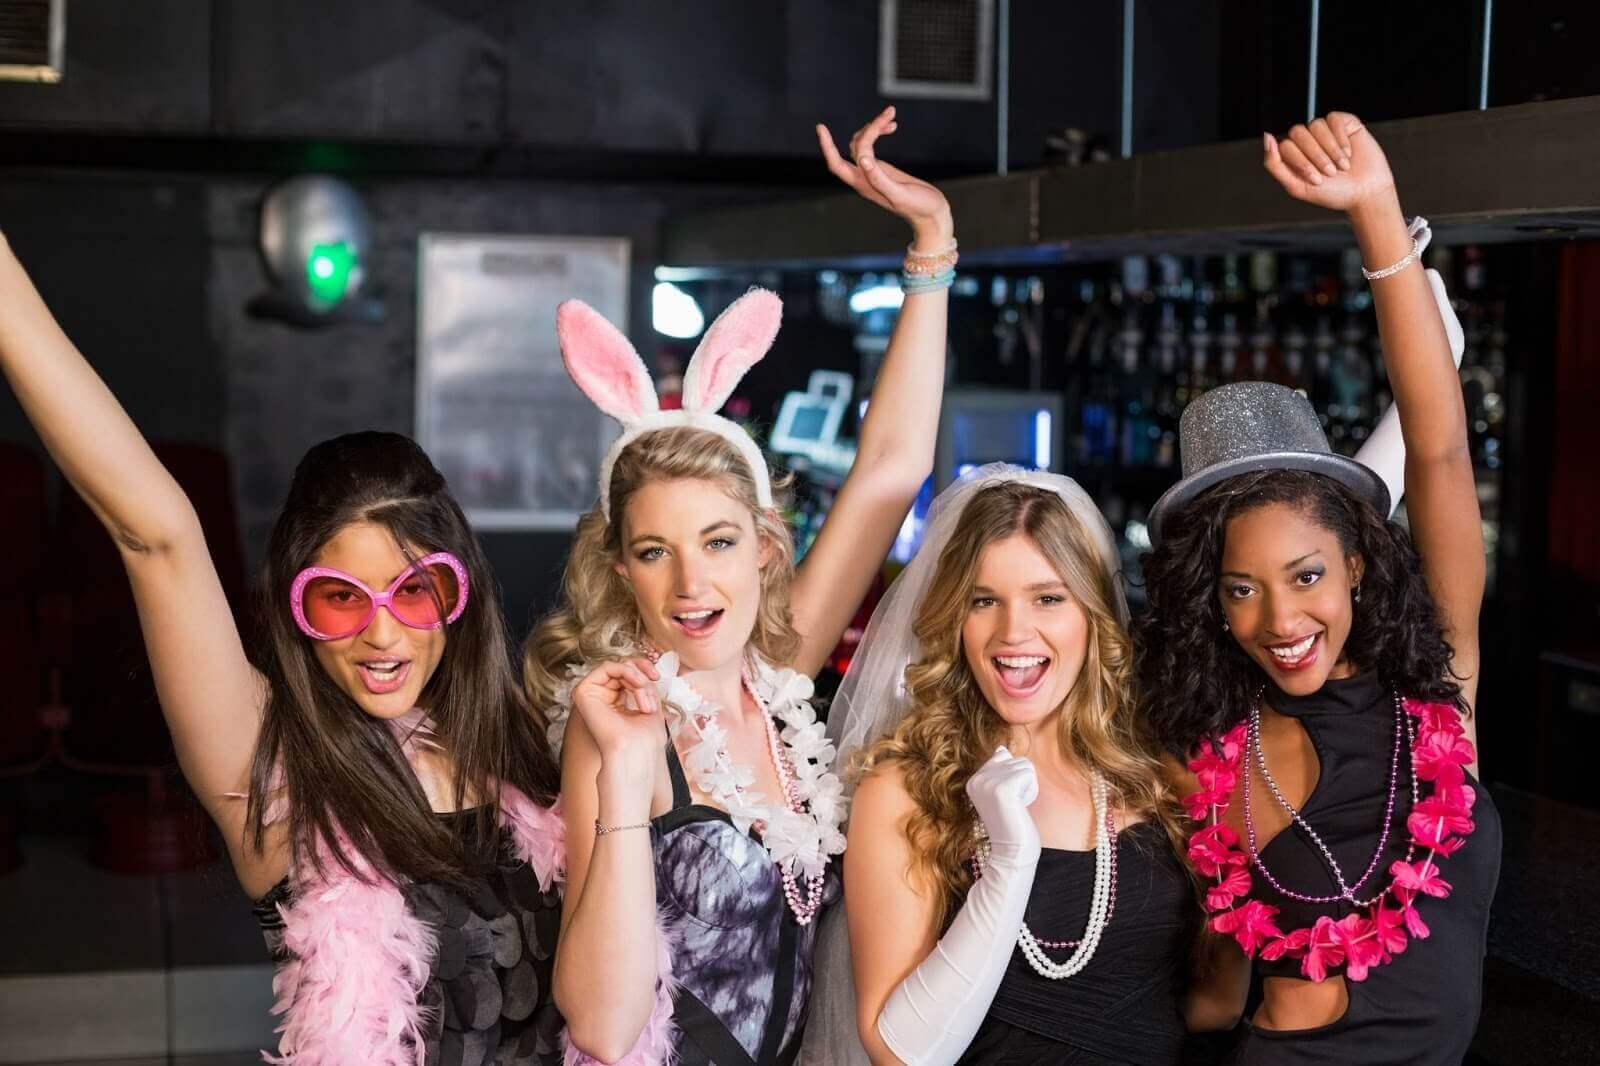 17 Crowd-Pleasing Bachelorette Party Ideas on a Budget